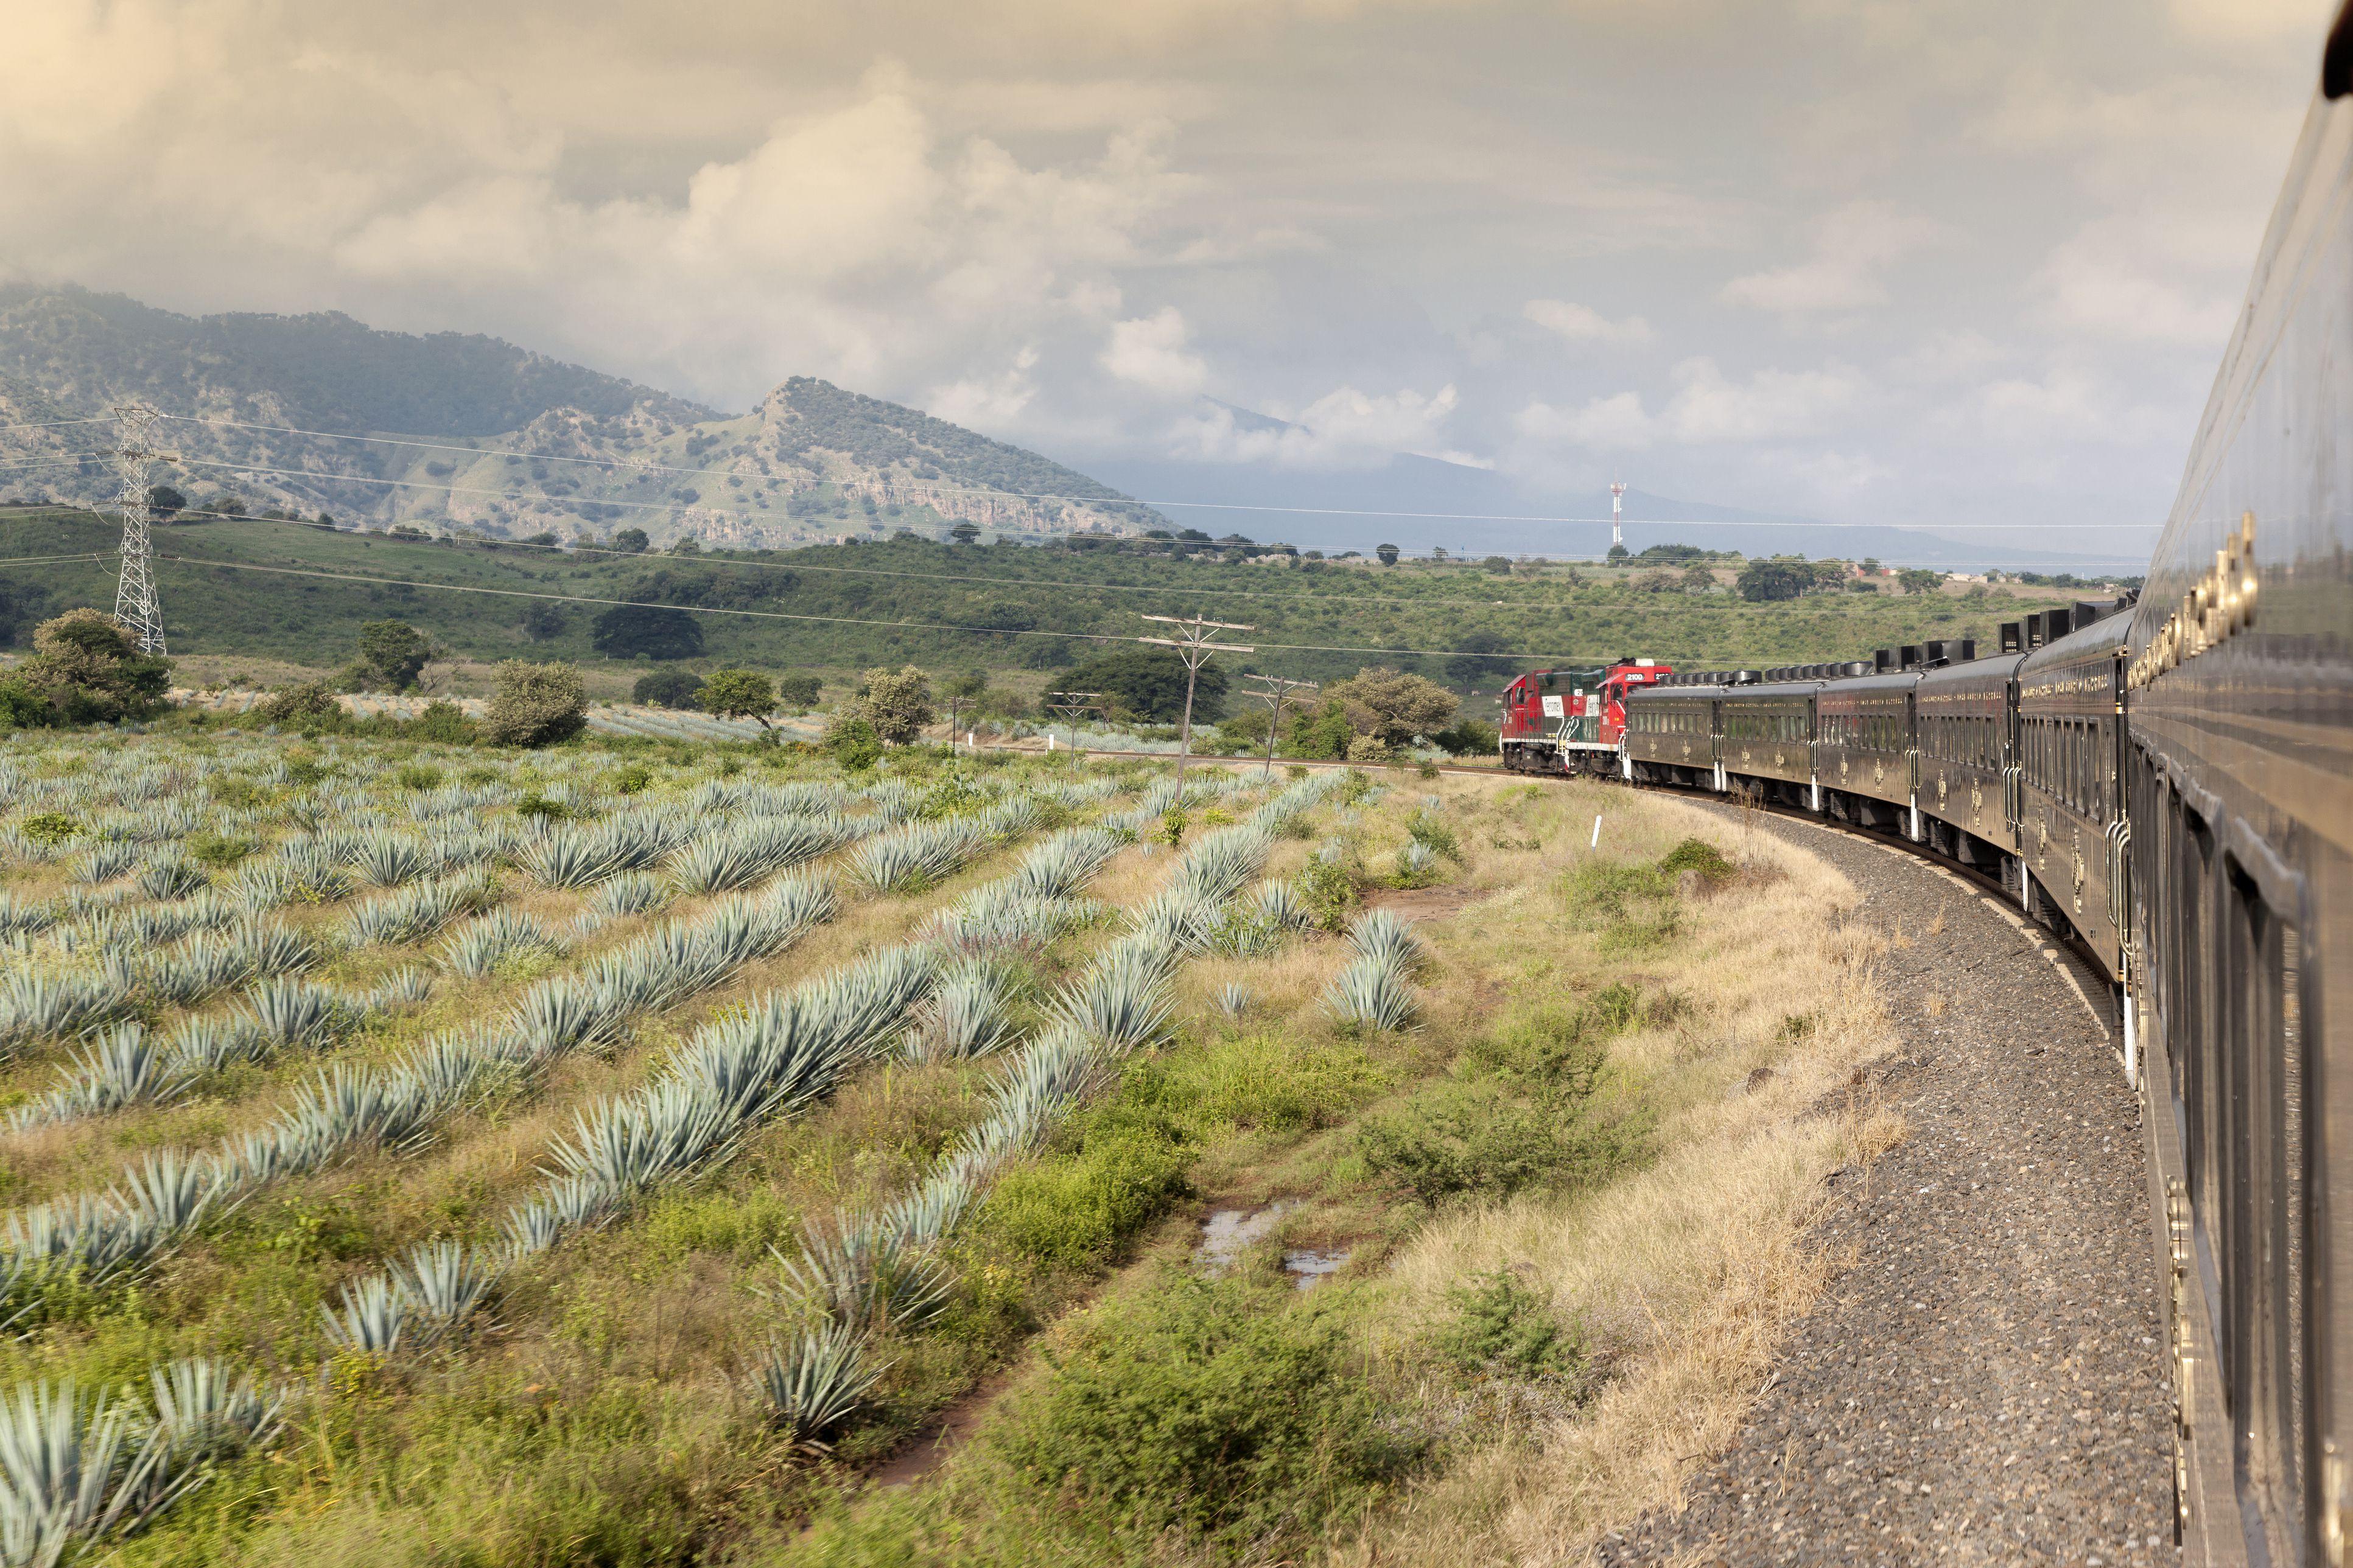 Train speeds past agave fields